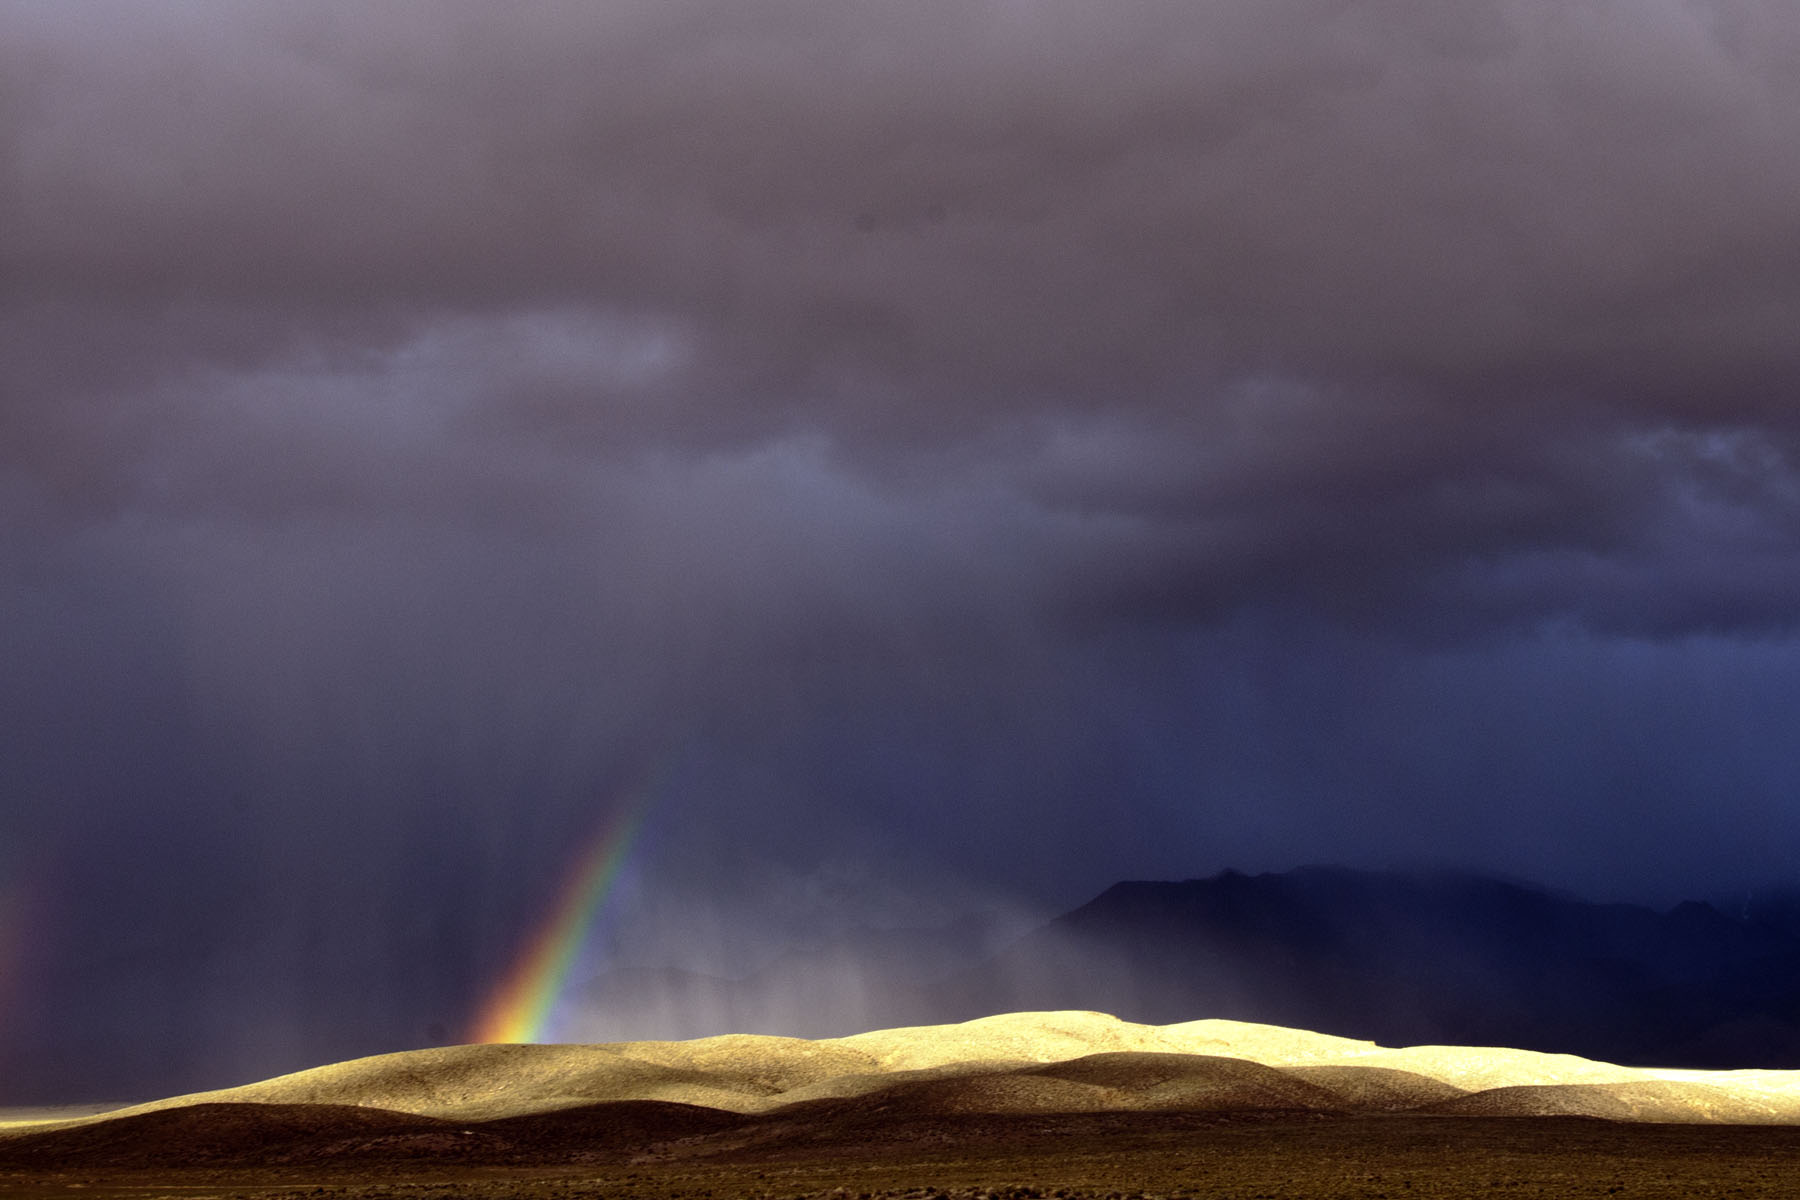 Rainbow over the Desatoya Mountains Wilderness Study Area.